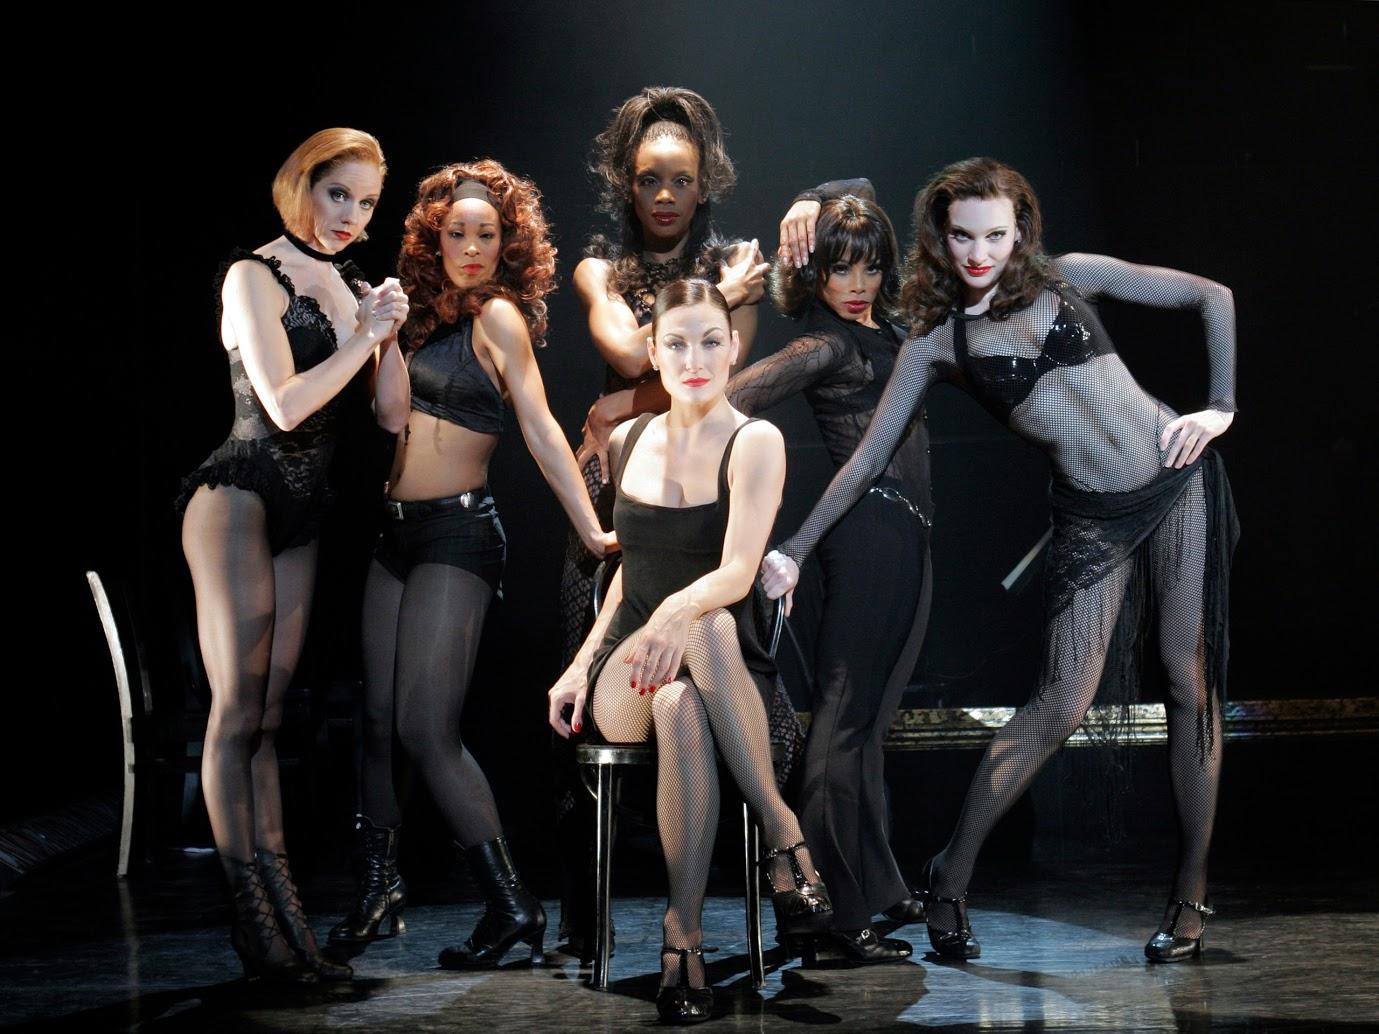 Broadway In Chicago Announces Return of Tony Award® winning smash-hit CHICAGO, May 10-15 2016 1  Terra C MacLeod as Velma Kelly and the Merry MurderessesCHICAGOCredit: Paul Kolnik